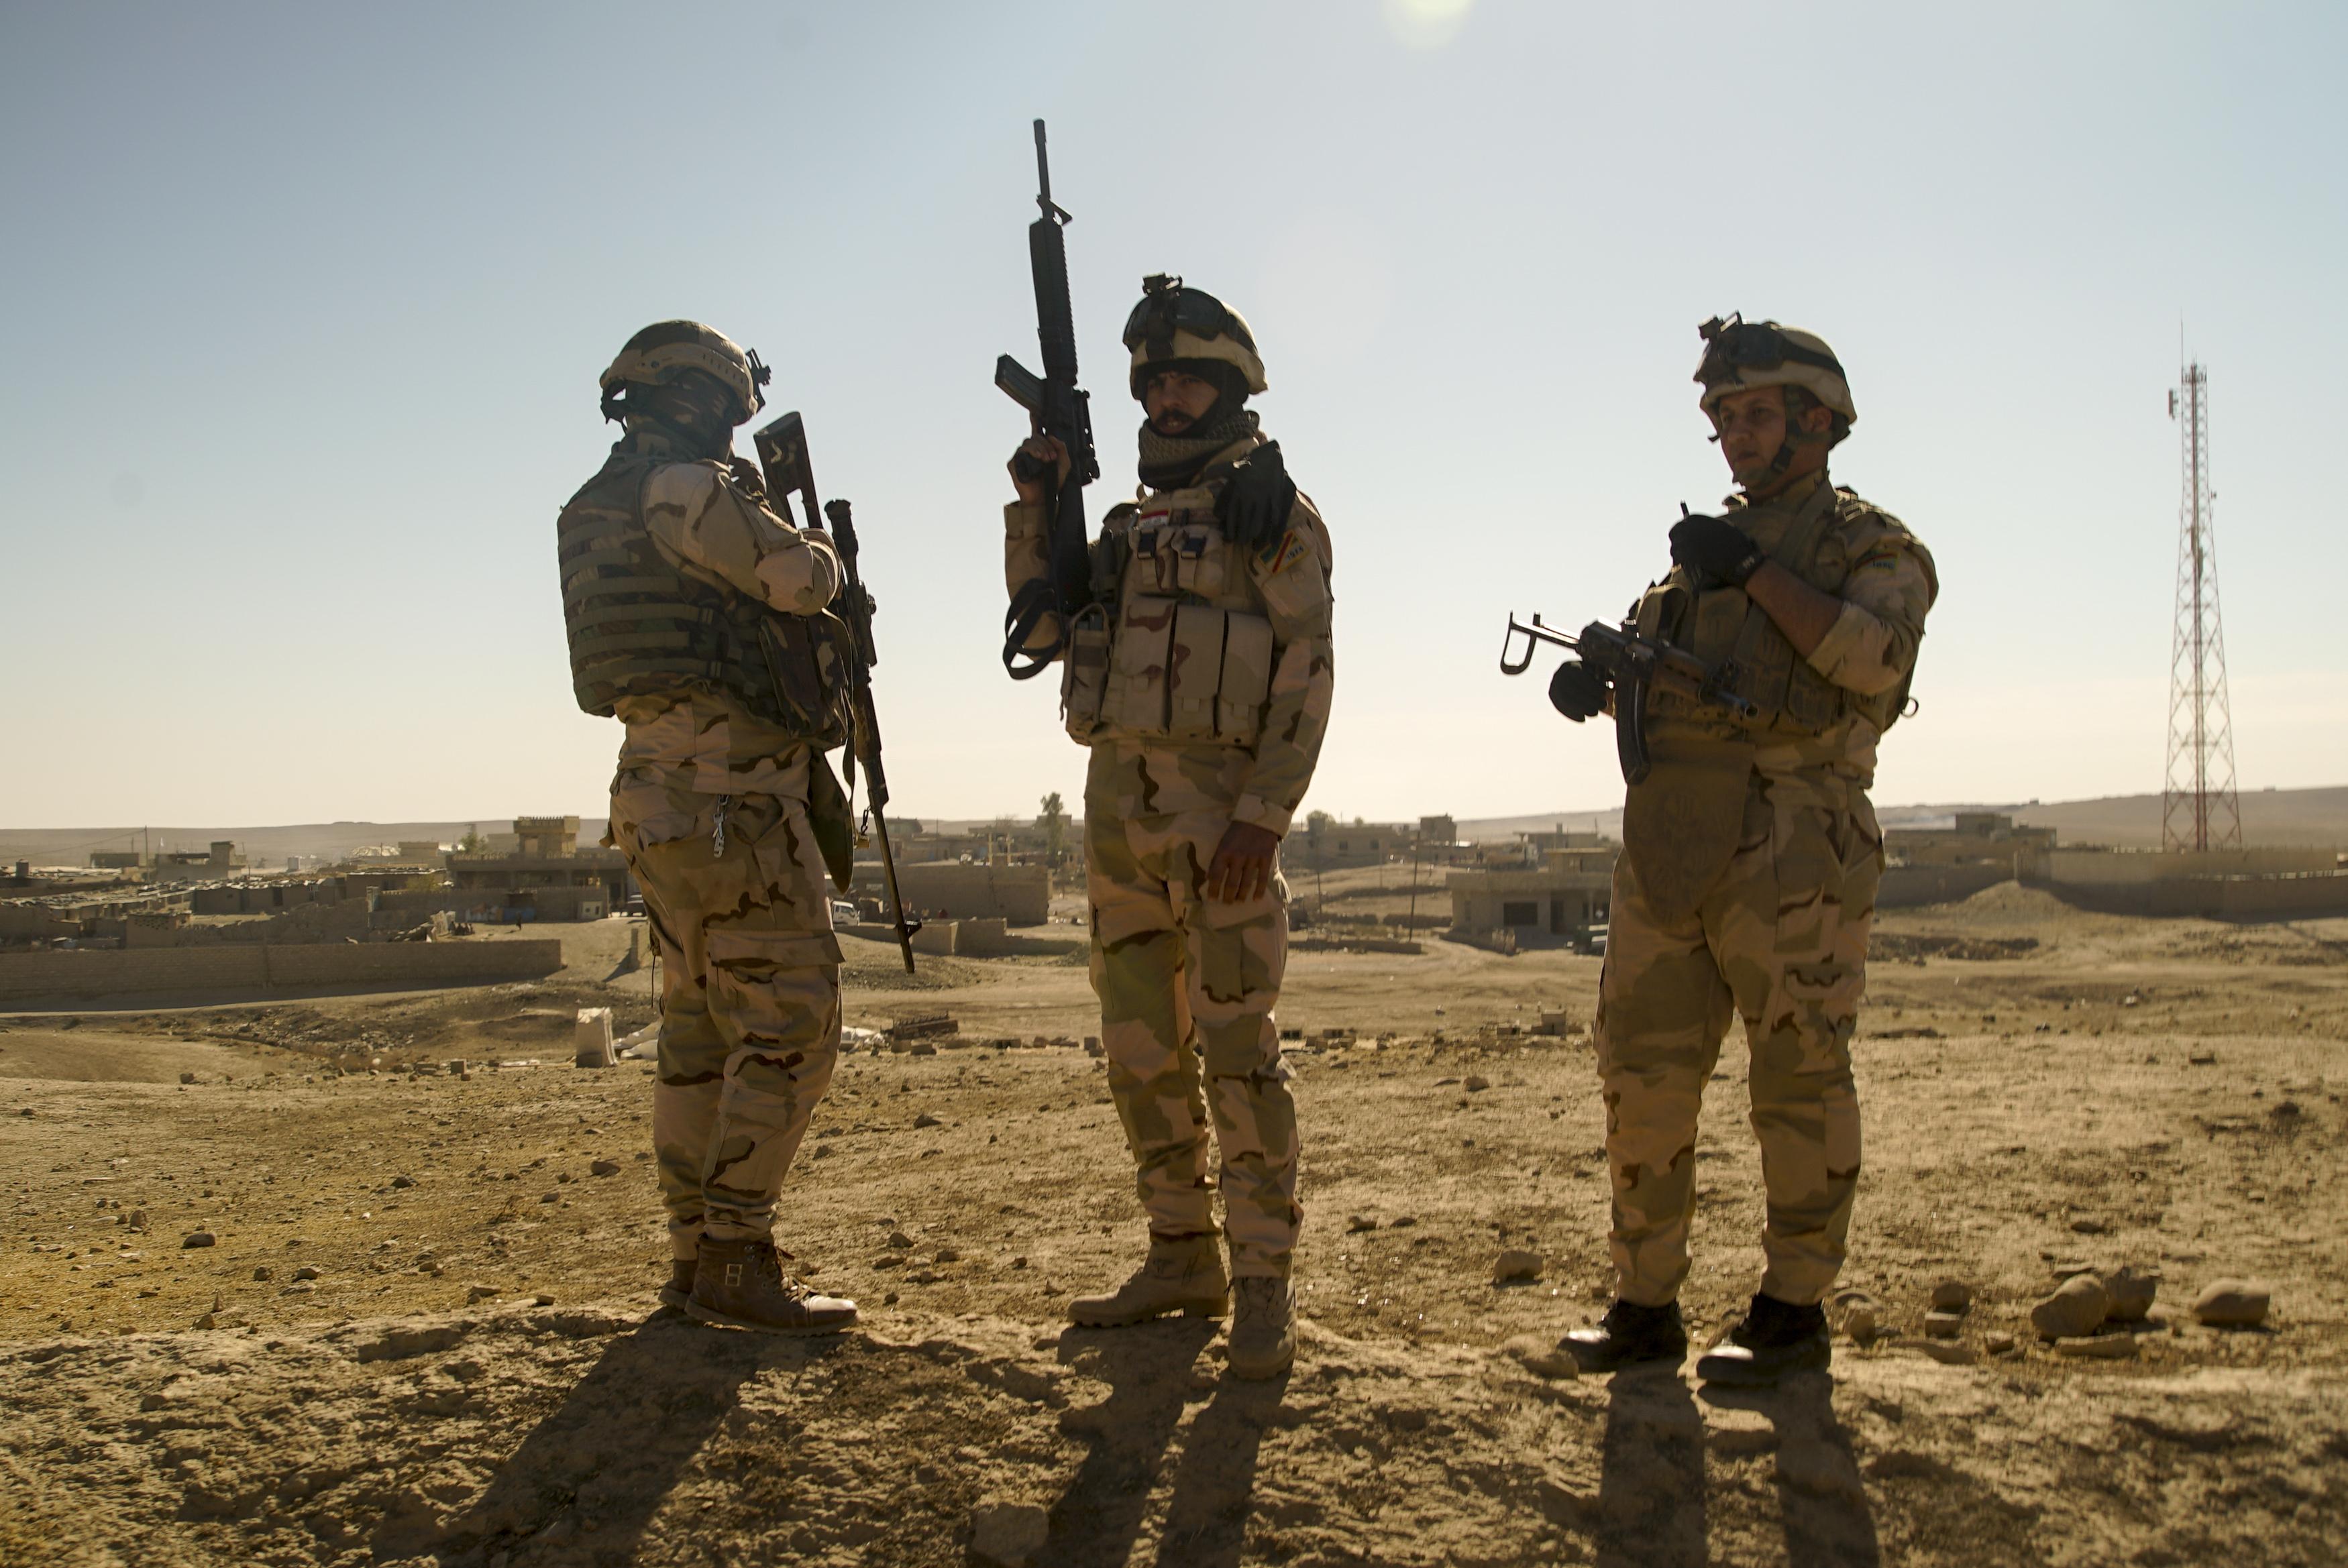 https://upload.wikimedia.org/wikipedia/commons/f/f6/Iraqi_Army_soldiers._South_of_Mosul%2C_Northern_Iraq%2C_Western_Asia._23_November%2C_2016.jpg